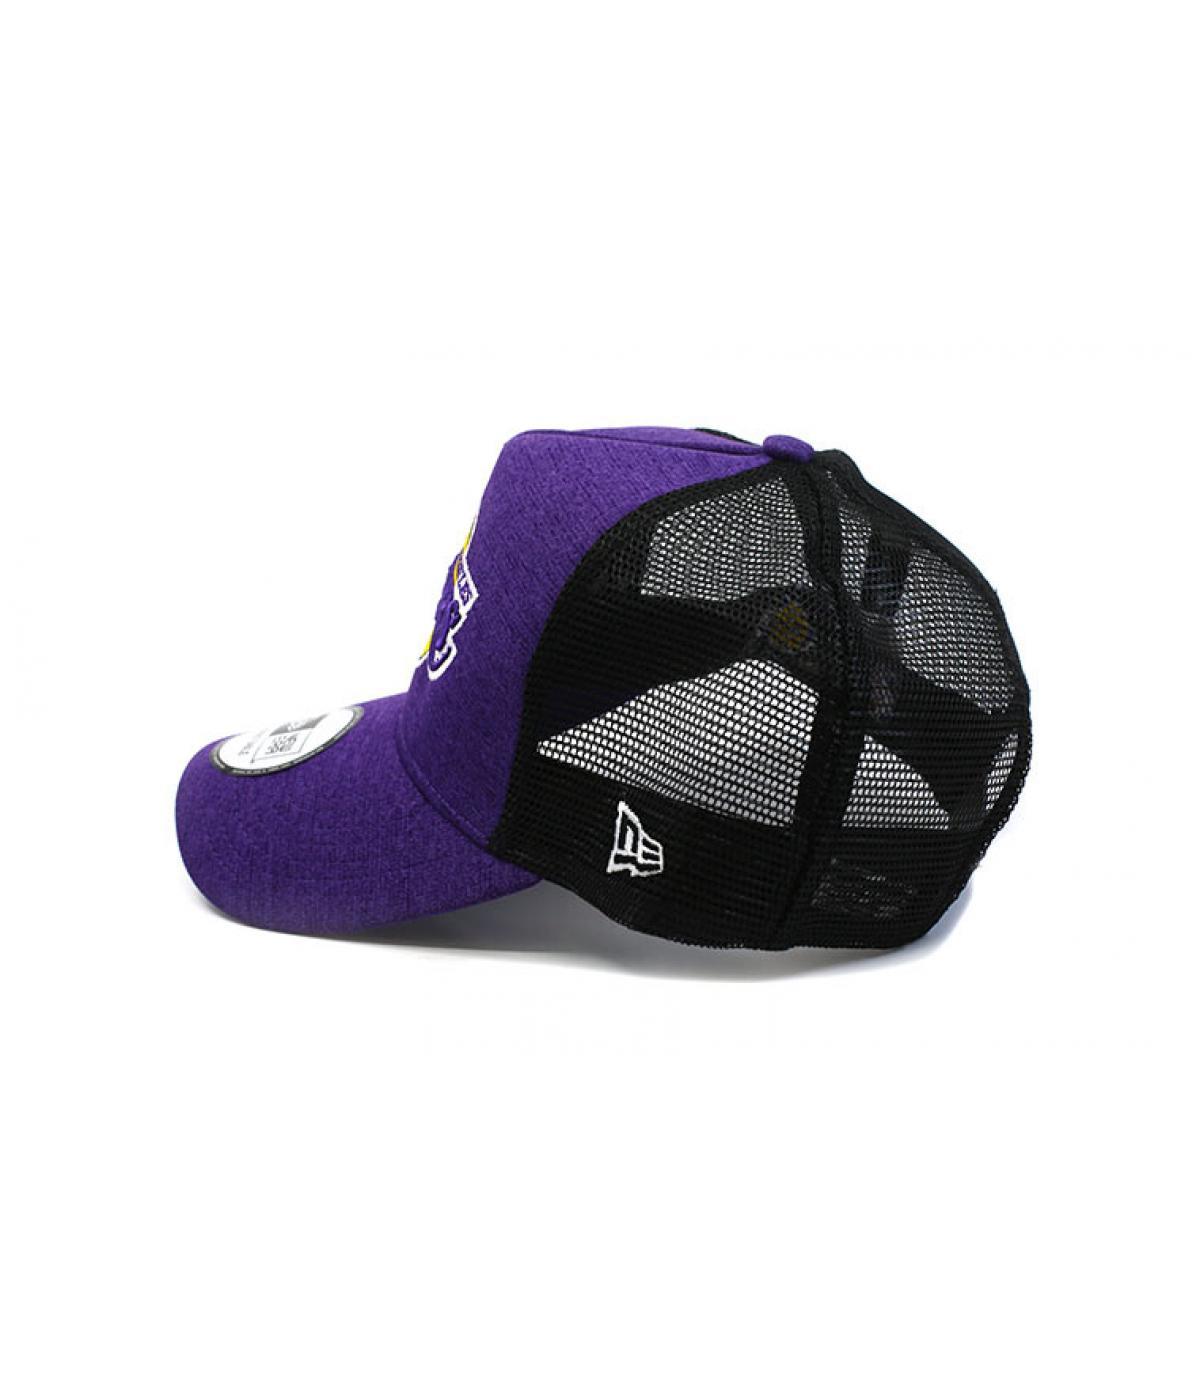 Détails Trucker Shadow Tech Lakers - image 4